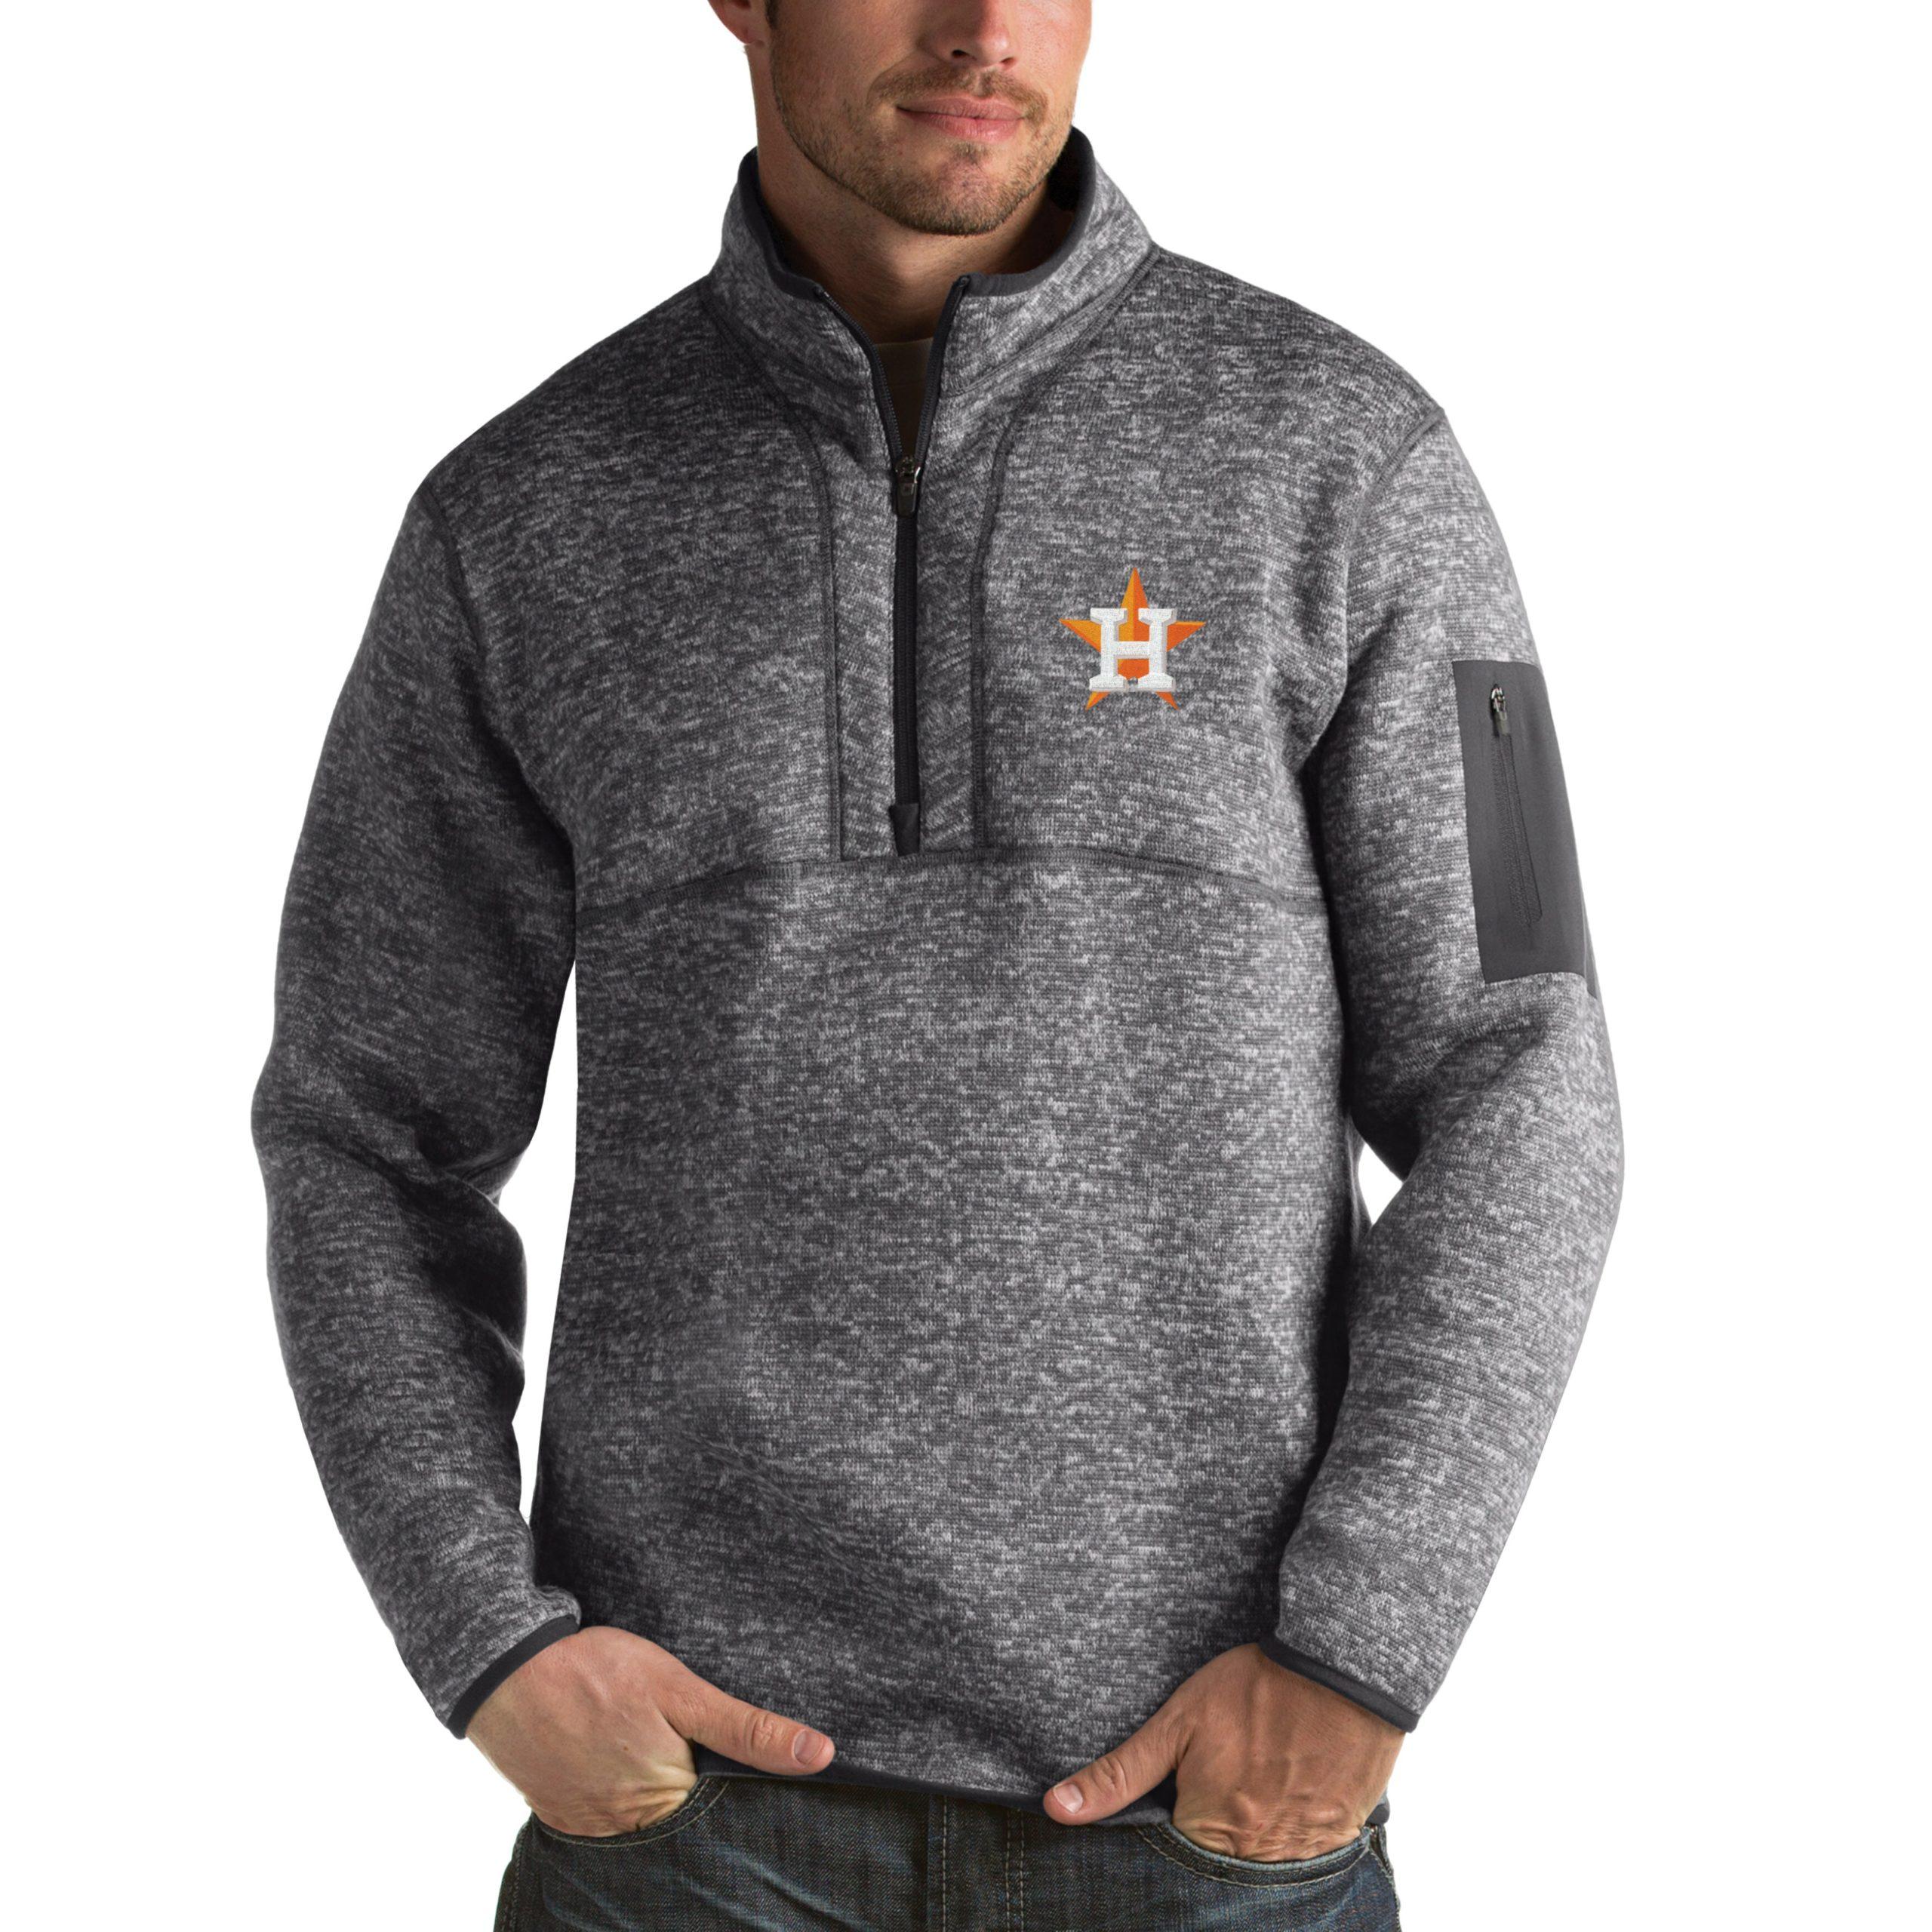 Houston Astros Antigua Fortune Half-Zip Sweater - Heathered Charcoal